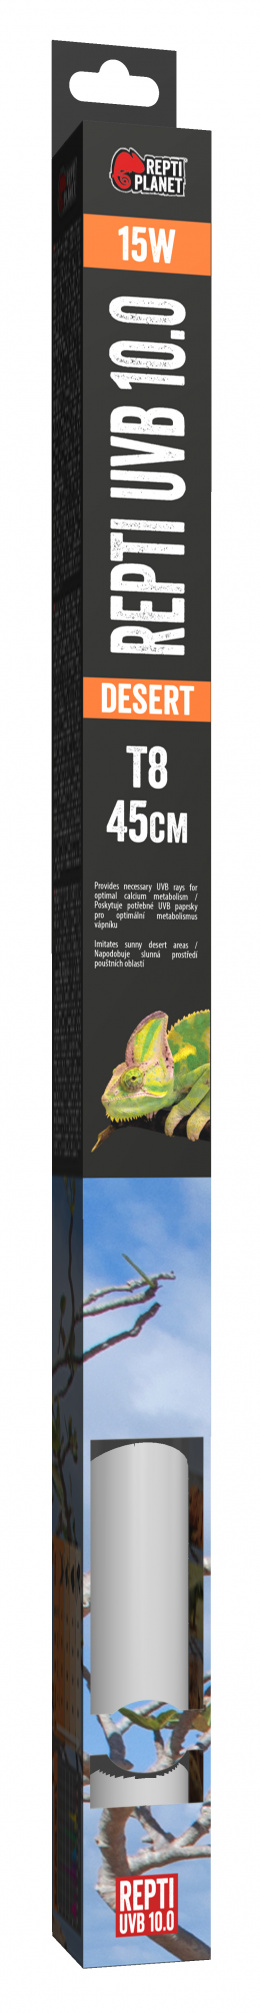 RP ziarivka Fluorescent UVB 10.0 45cm 15W